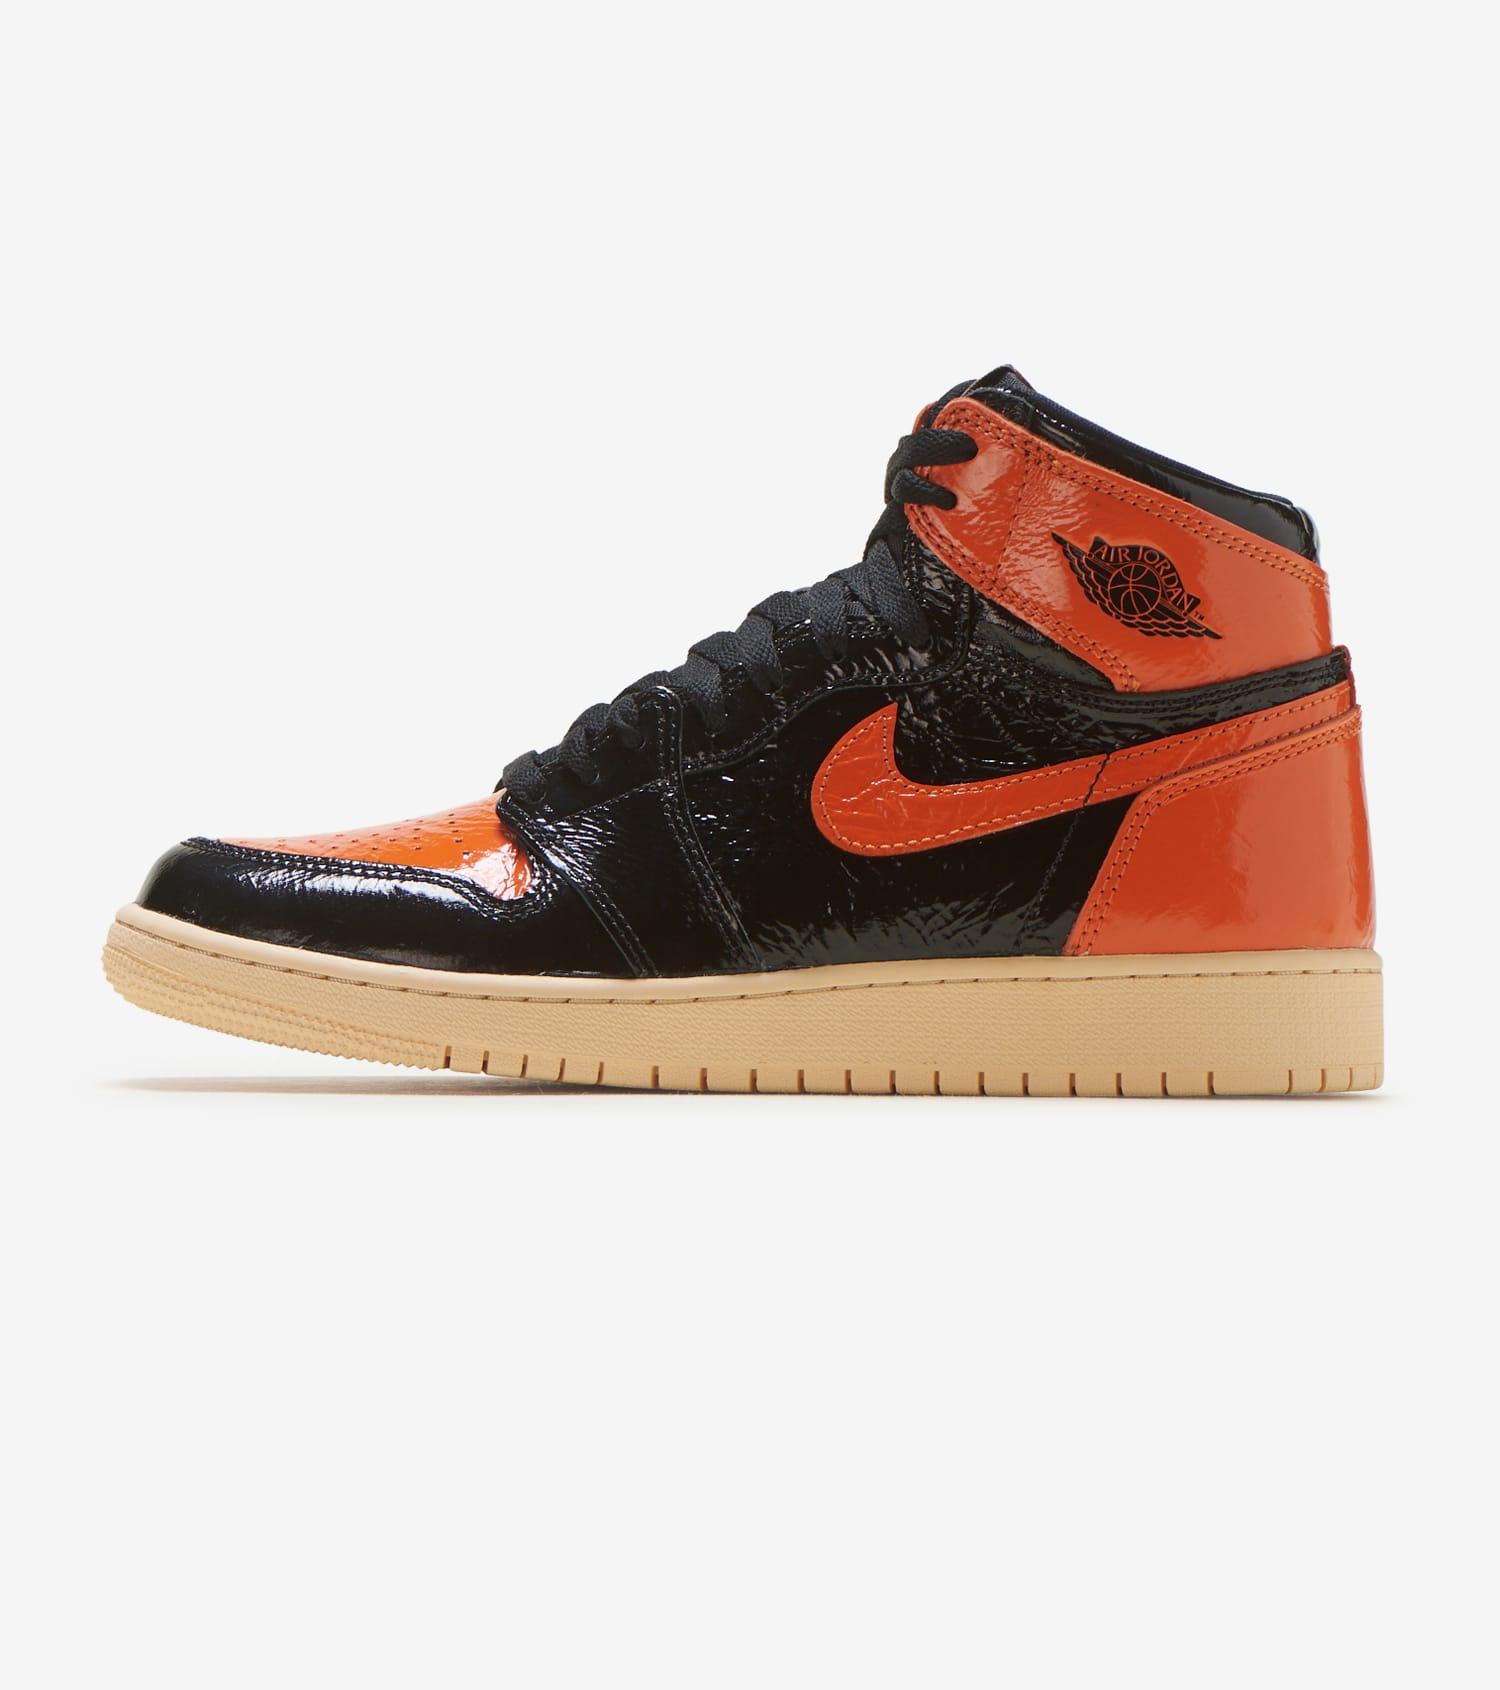 50% off factory outlets good looking Air Jordan 1 High OG